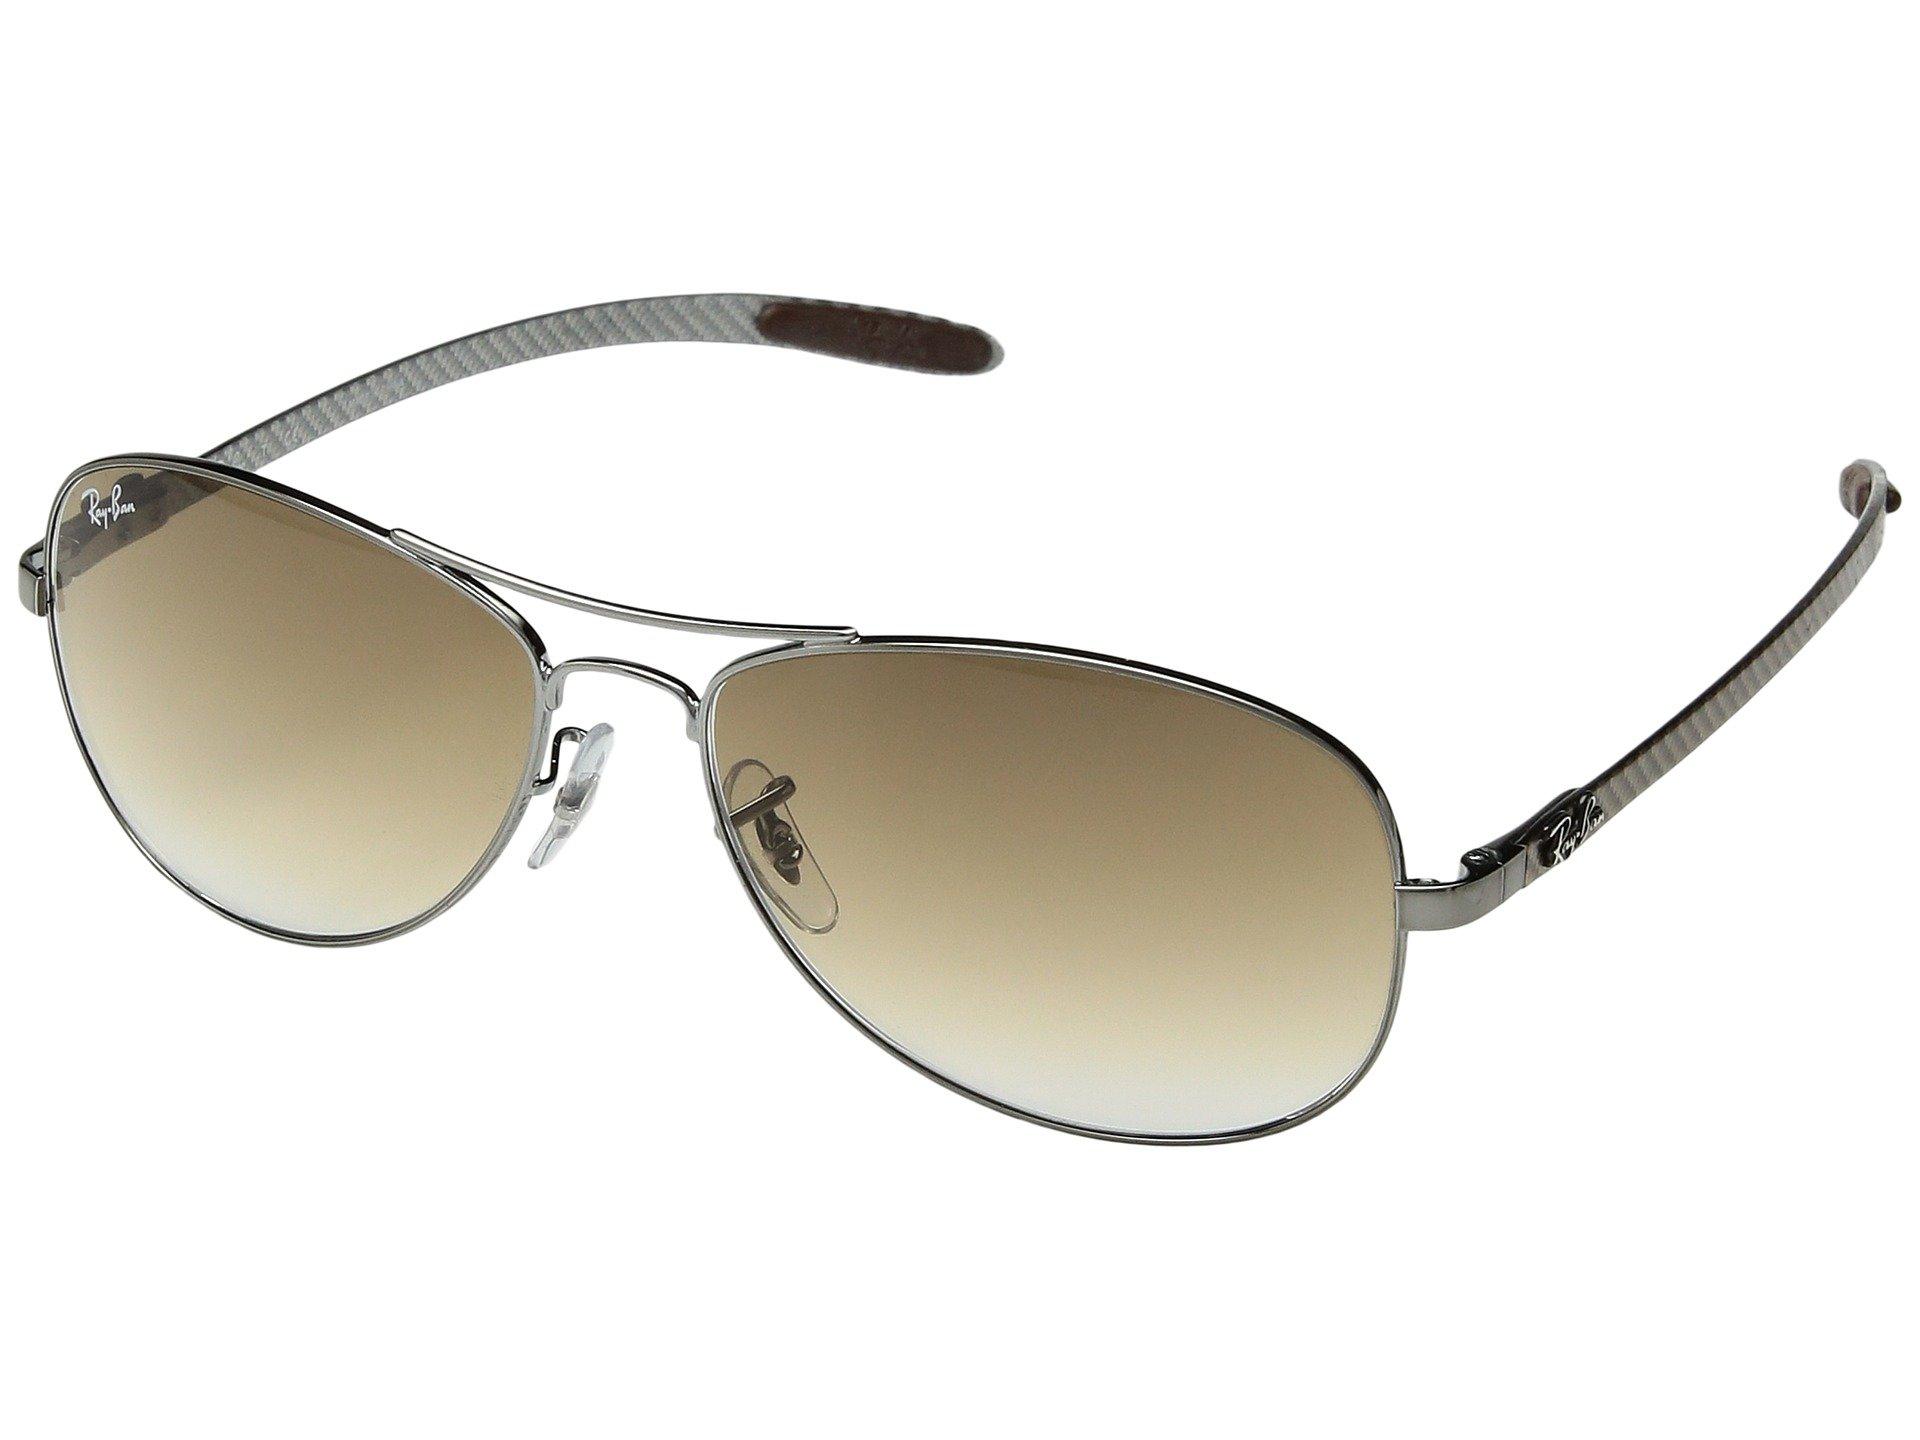 4e1affde6a Men s Mirrored Lenses Sunglasses + FREE SHIPPING